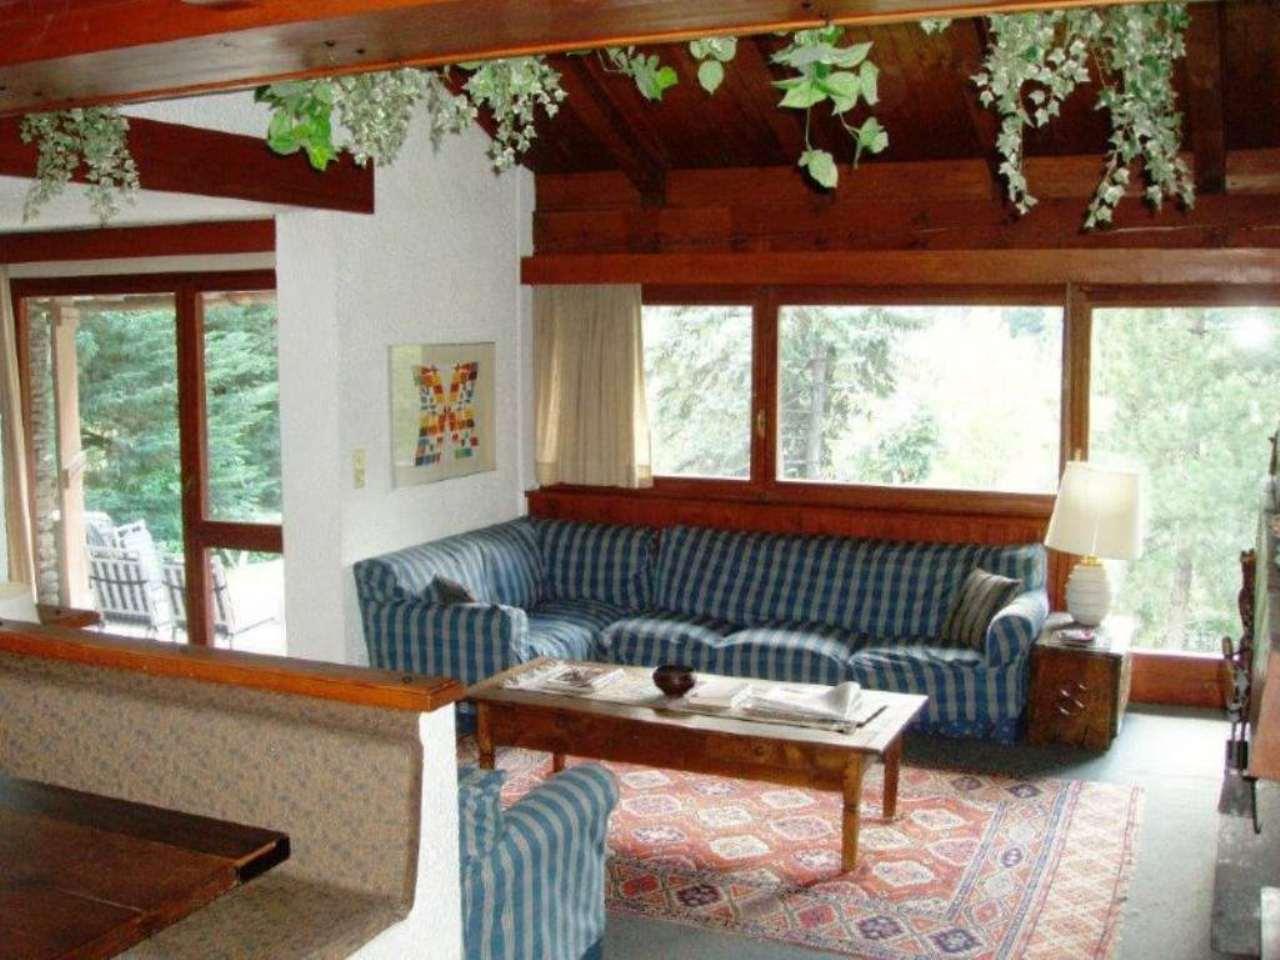 Villa in Vendita a Courmayeur: 5 locali, 450 mq - Foto 6